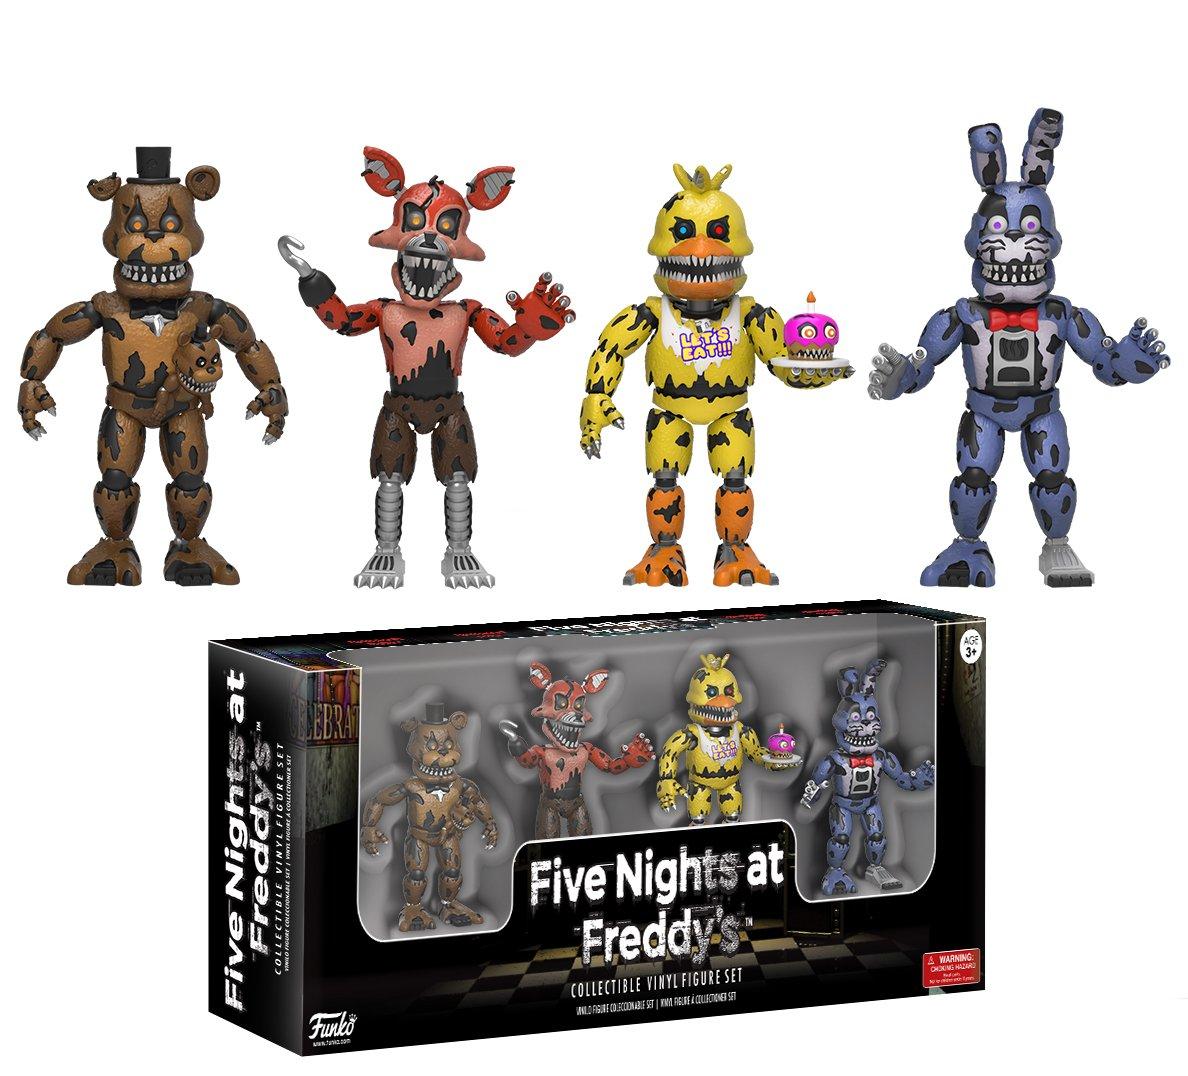 Funko Five Nights At Freddys 2 Nightmare Edition Vinyl Bott Pop Fnaf Freddy Figure Four Pack Figures Toys Games